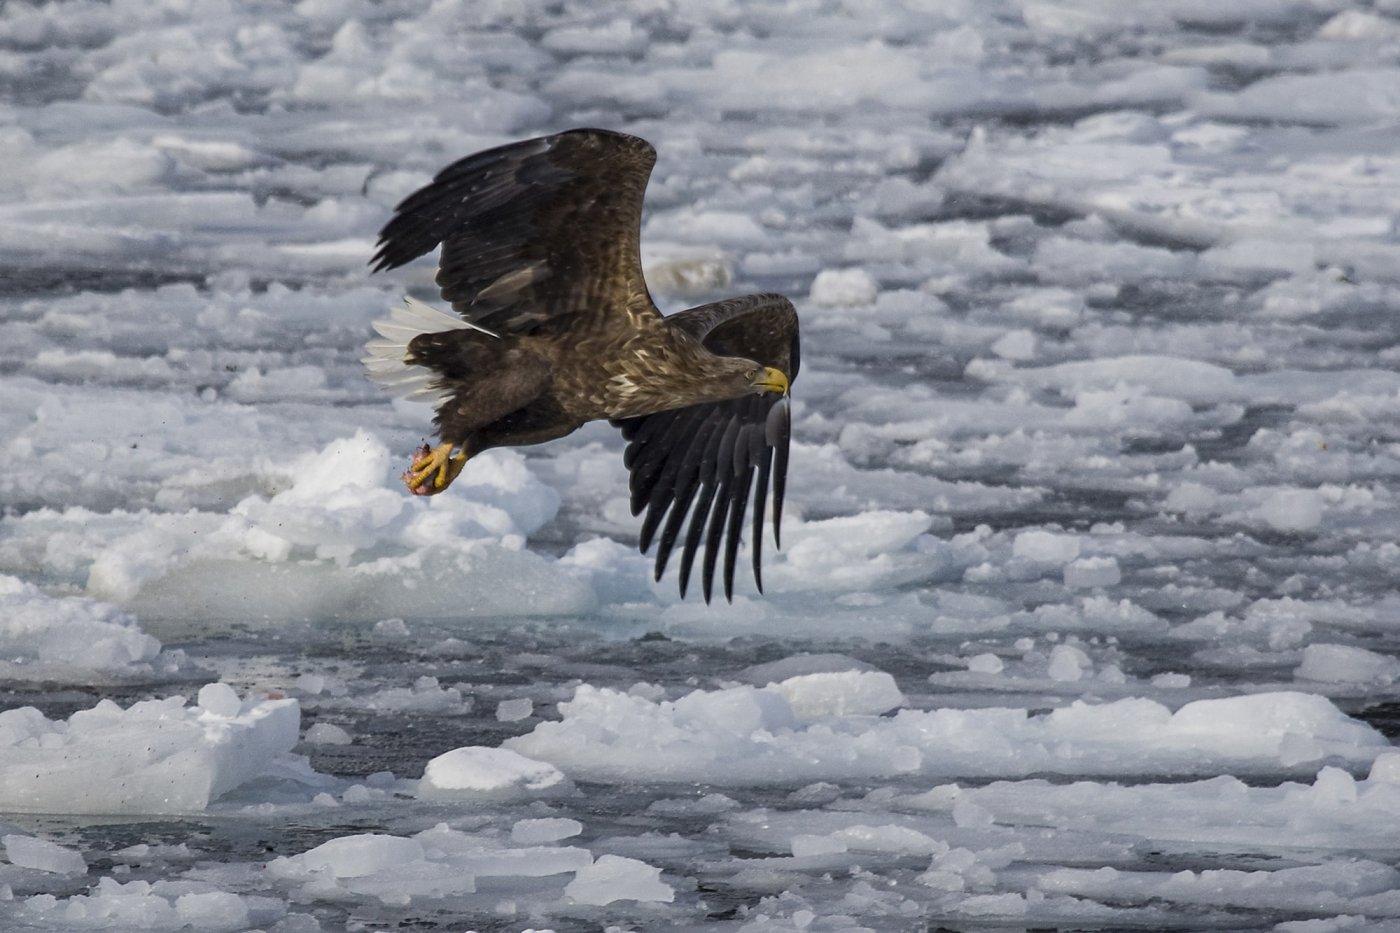 White-tailed Eagle -EN, Nattoralik -KAL, Havørn -DA, Haliaeetus albicilla -LAT. Photo by Carsten Egevang - Visit Greenland